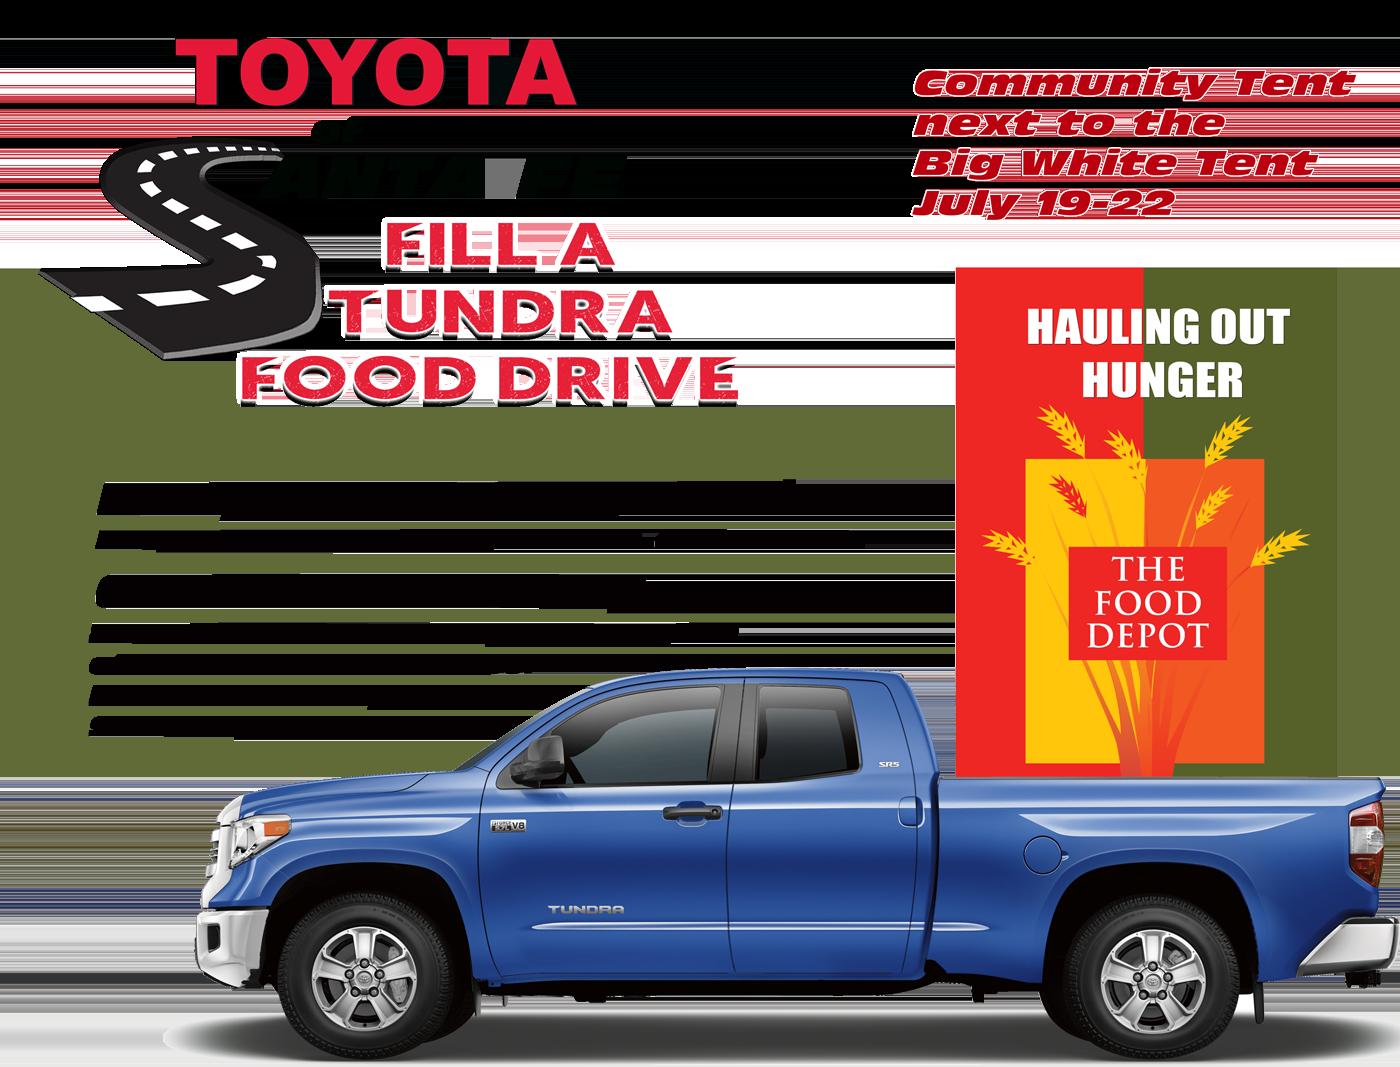 Fill A Tundra Food Drive July 19-22 at Parking Lots of Santa Fe Place Mall